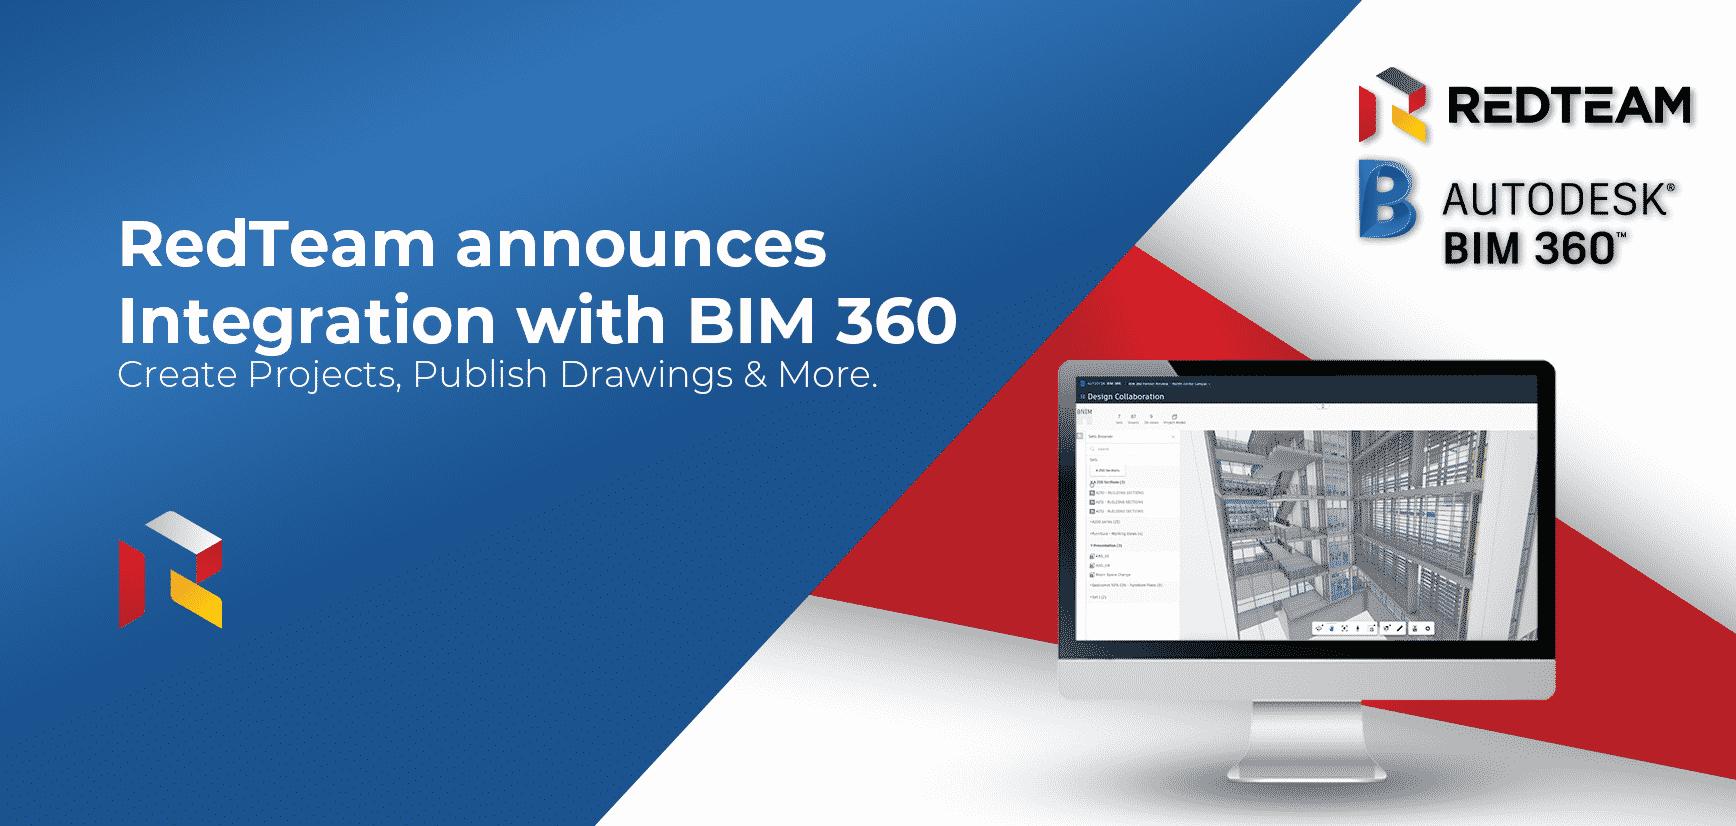 RedTeam Announces Integration with Autodesk BIM 360.